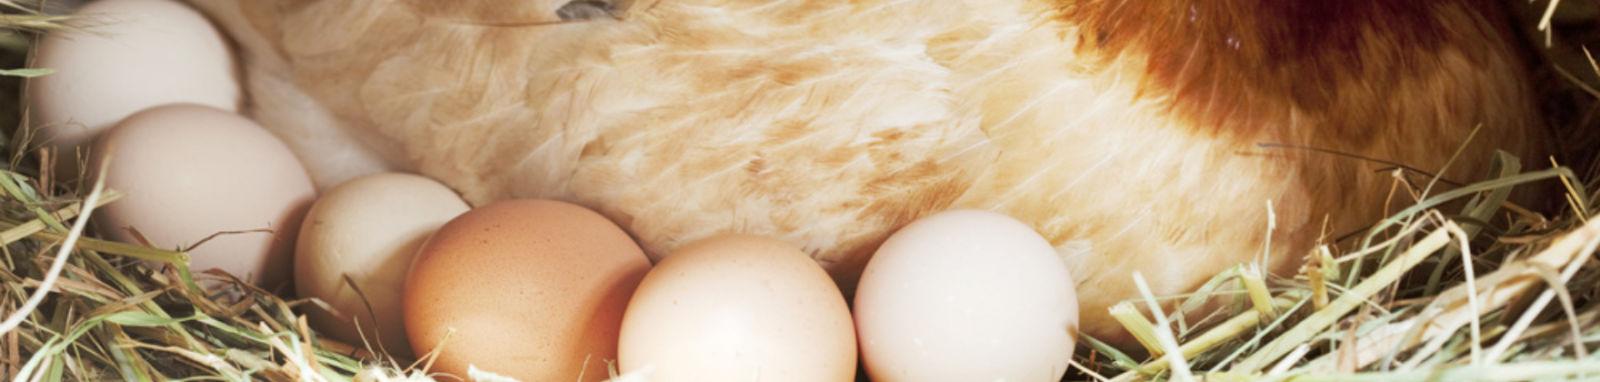 row of eggs under a hen